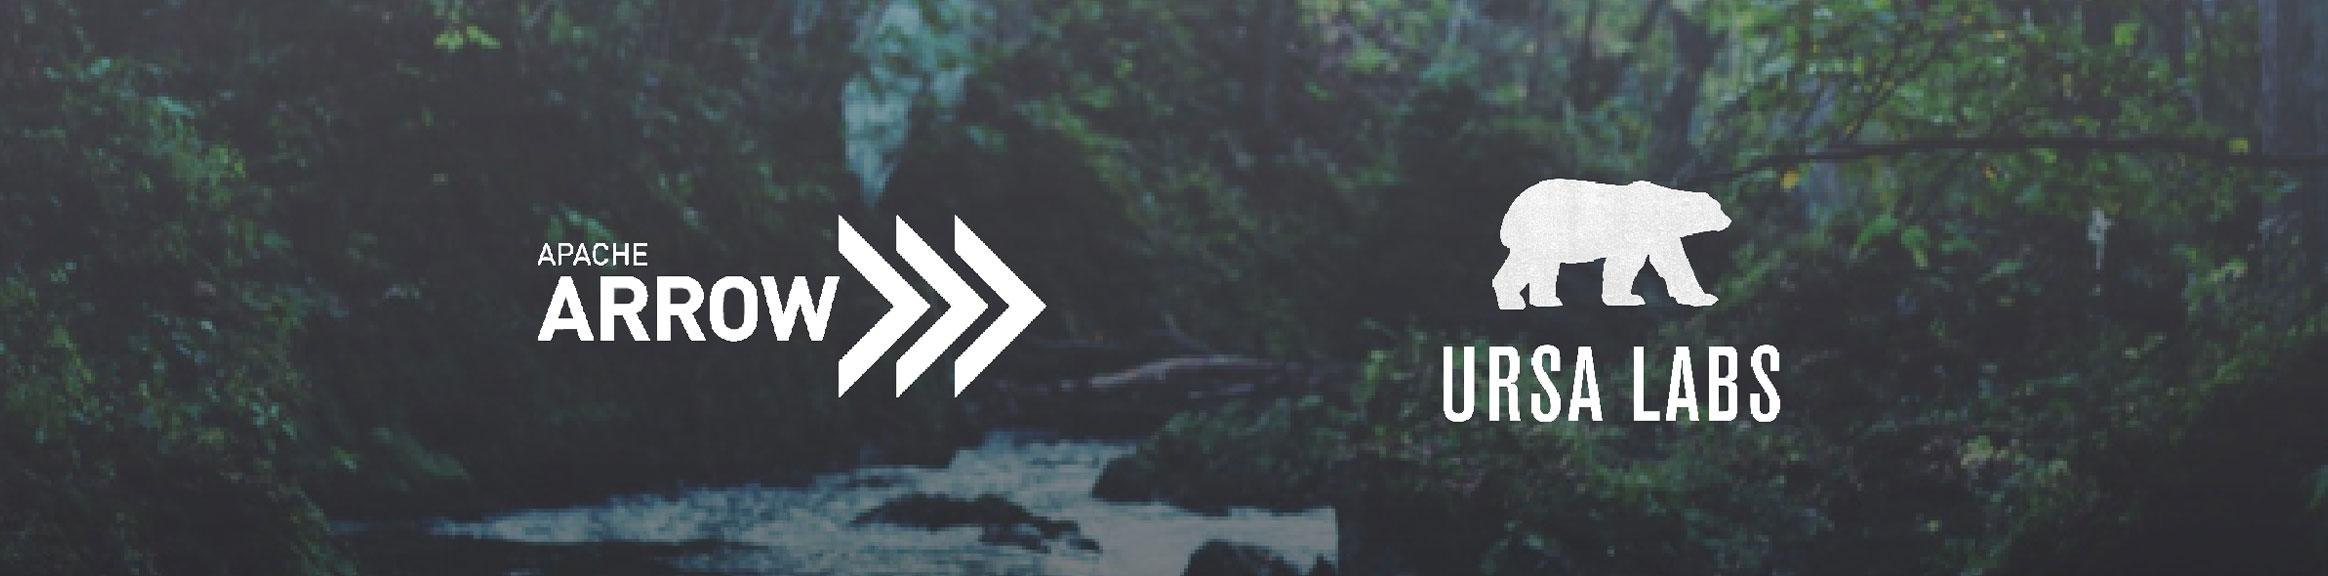 Apache Arrow and Ursa Labs Logos